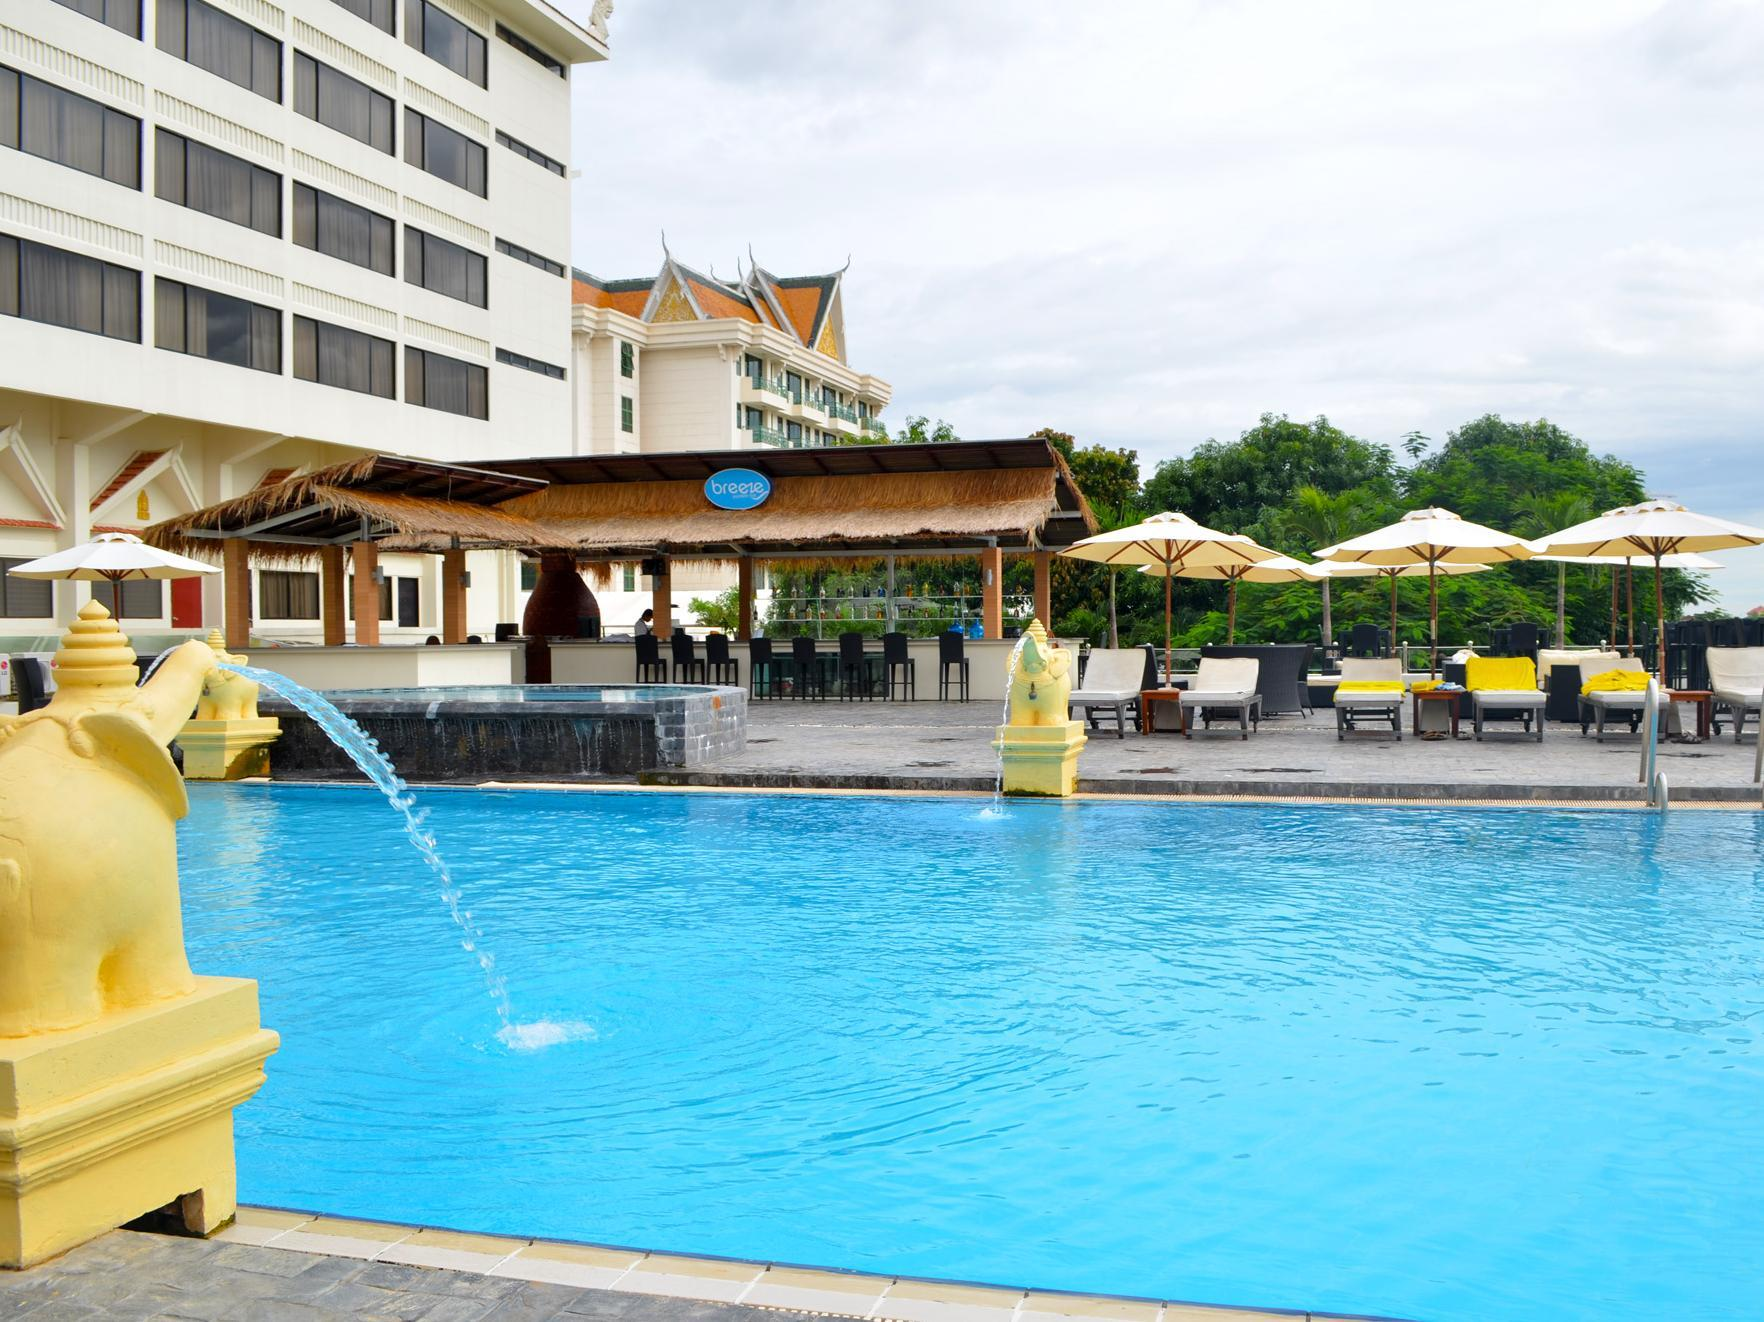 King Island (Koh Sdech) Cambodia  city photo : Hotel Cambodiana Phnom Penh Cambodia BEST DISCOUNT HOTEL RATES